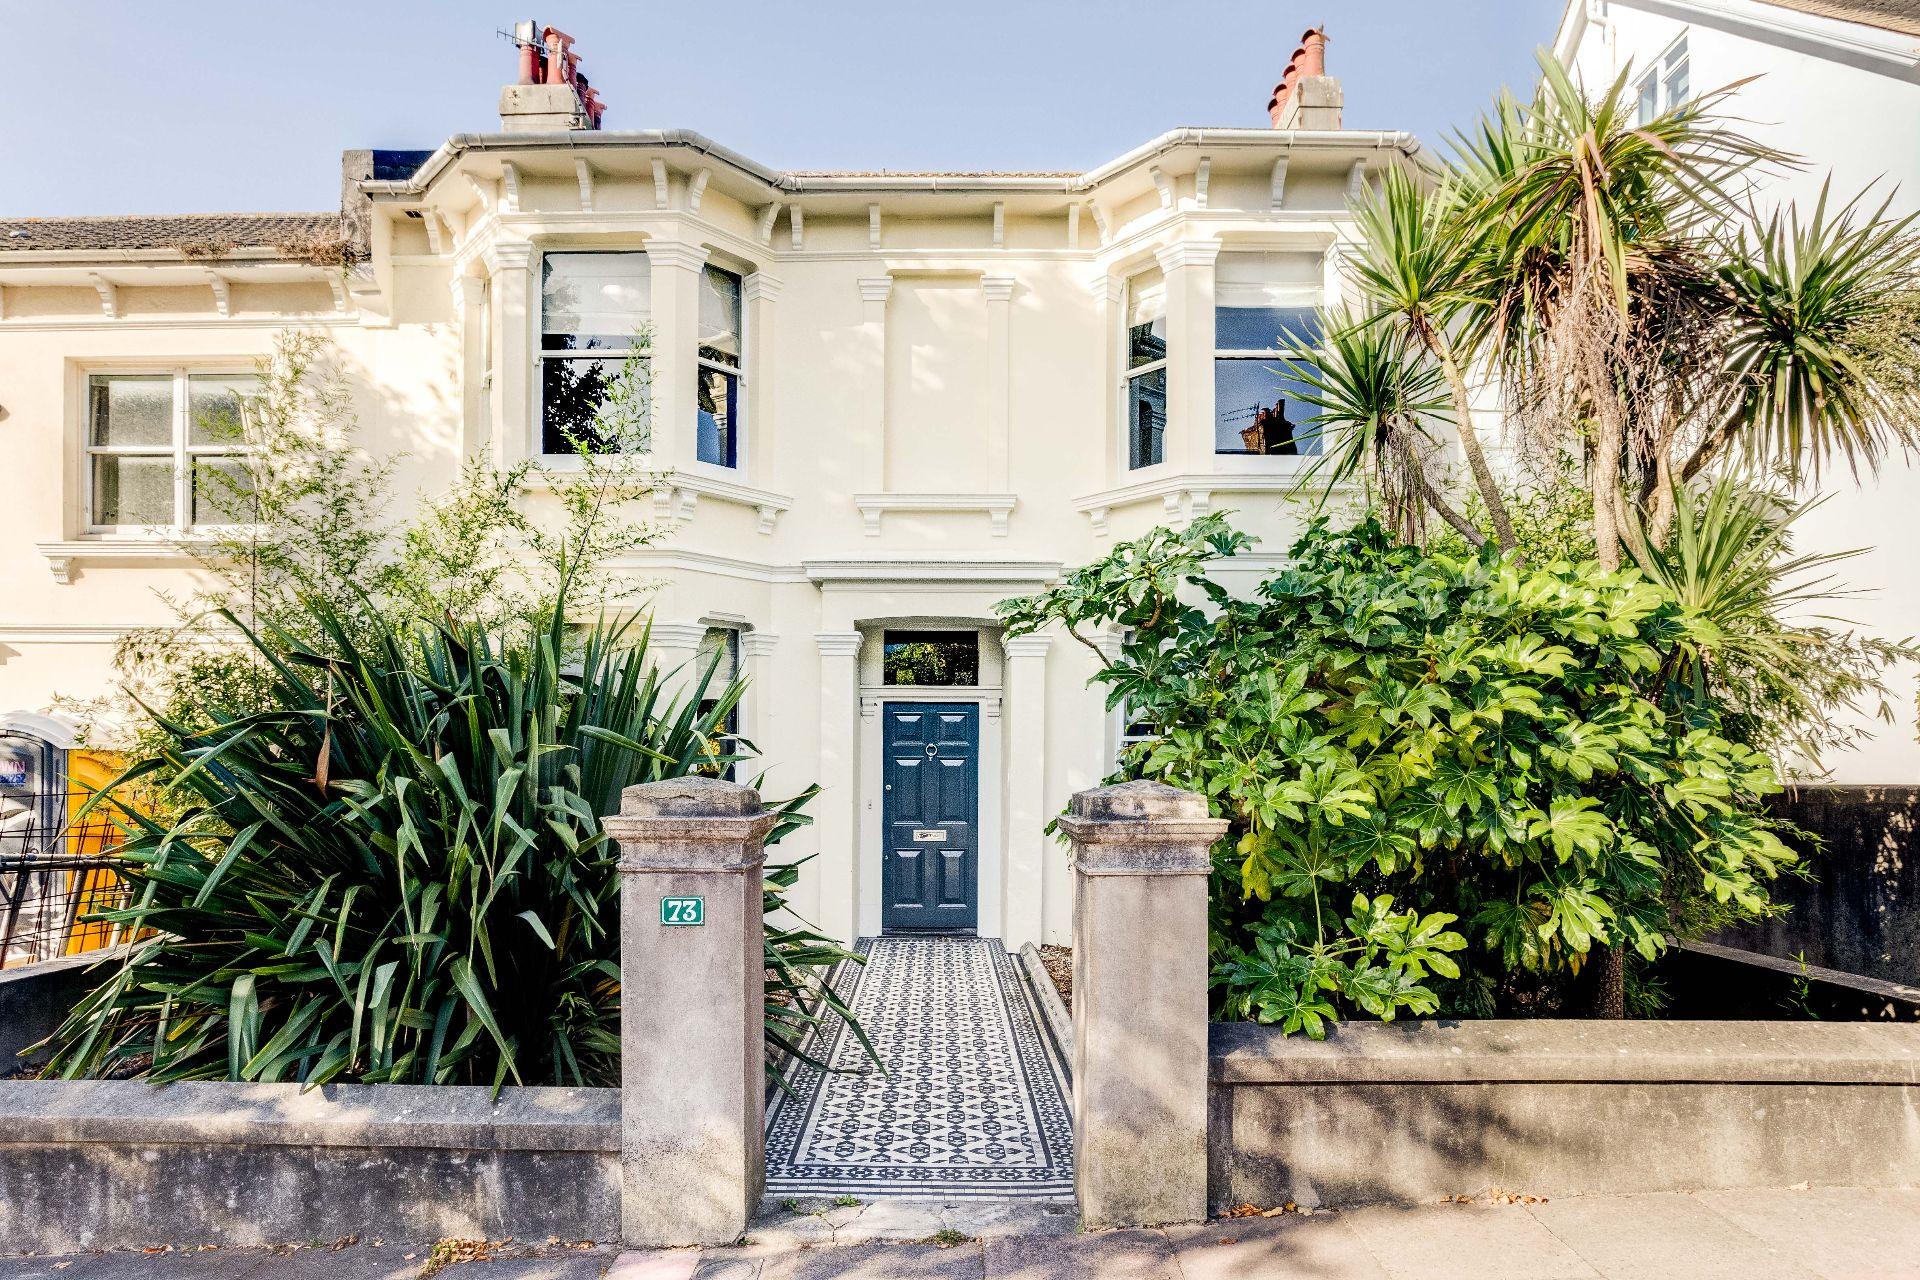 Beaconsfield Villas, Blakers Park, Brighton